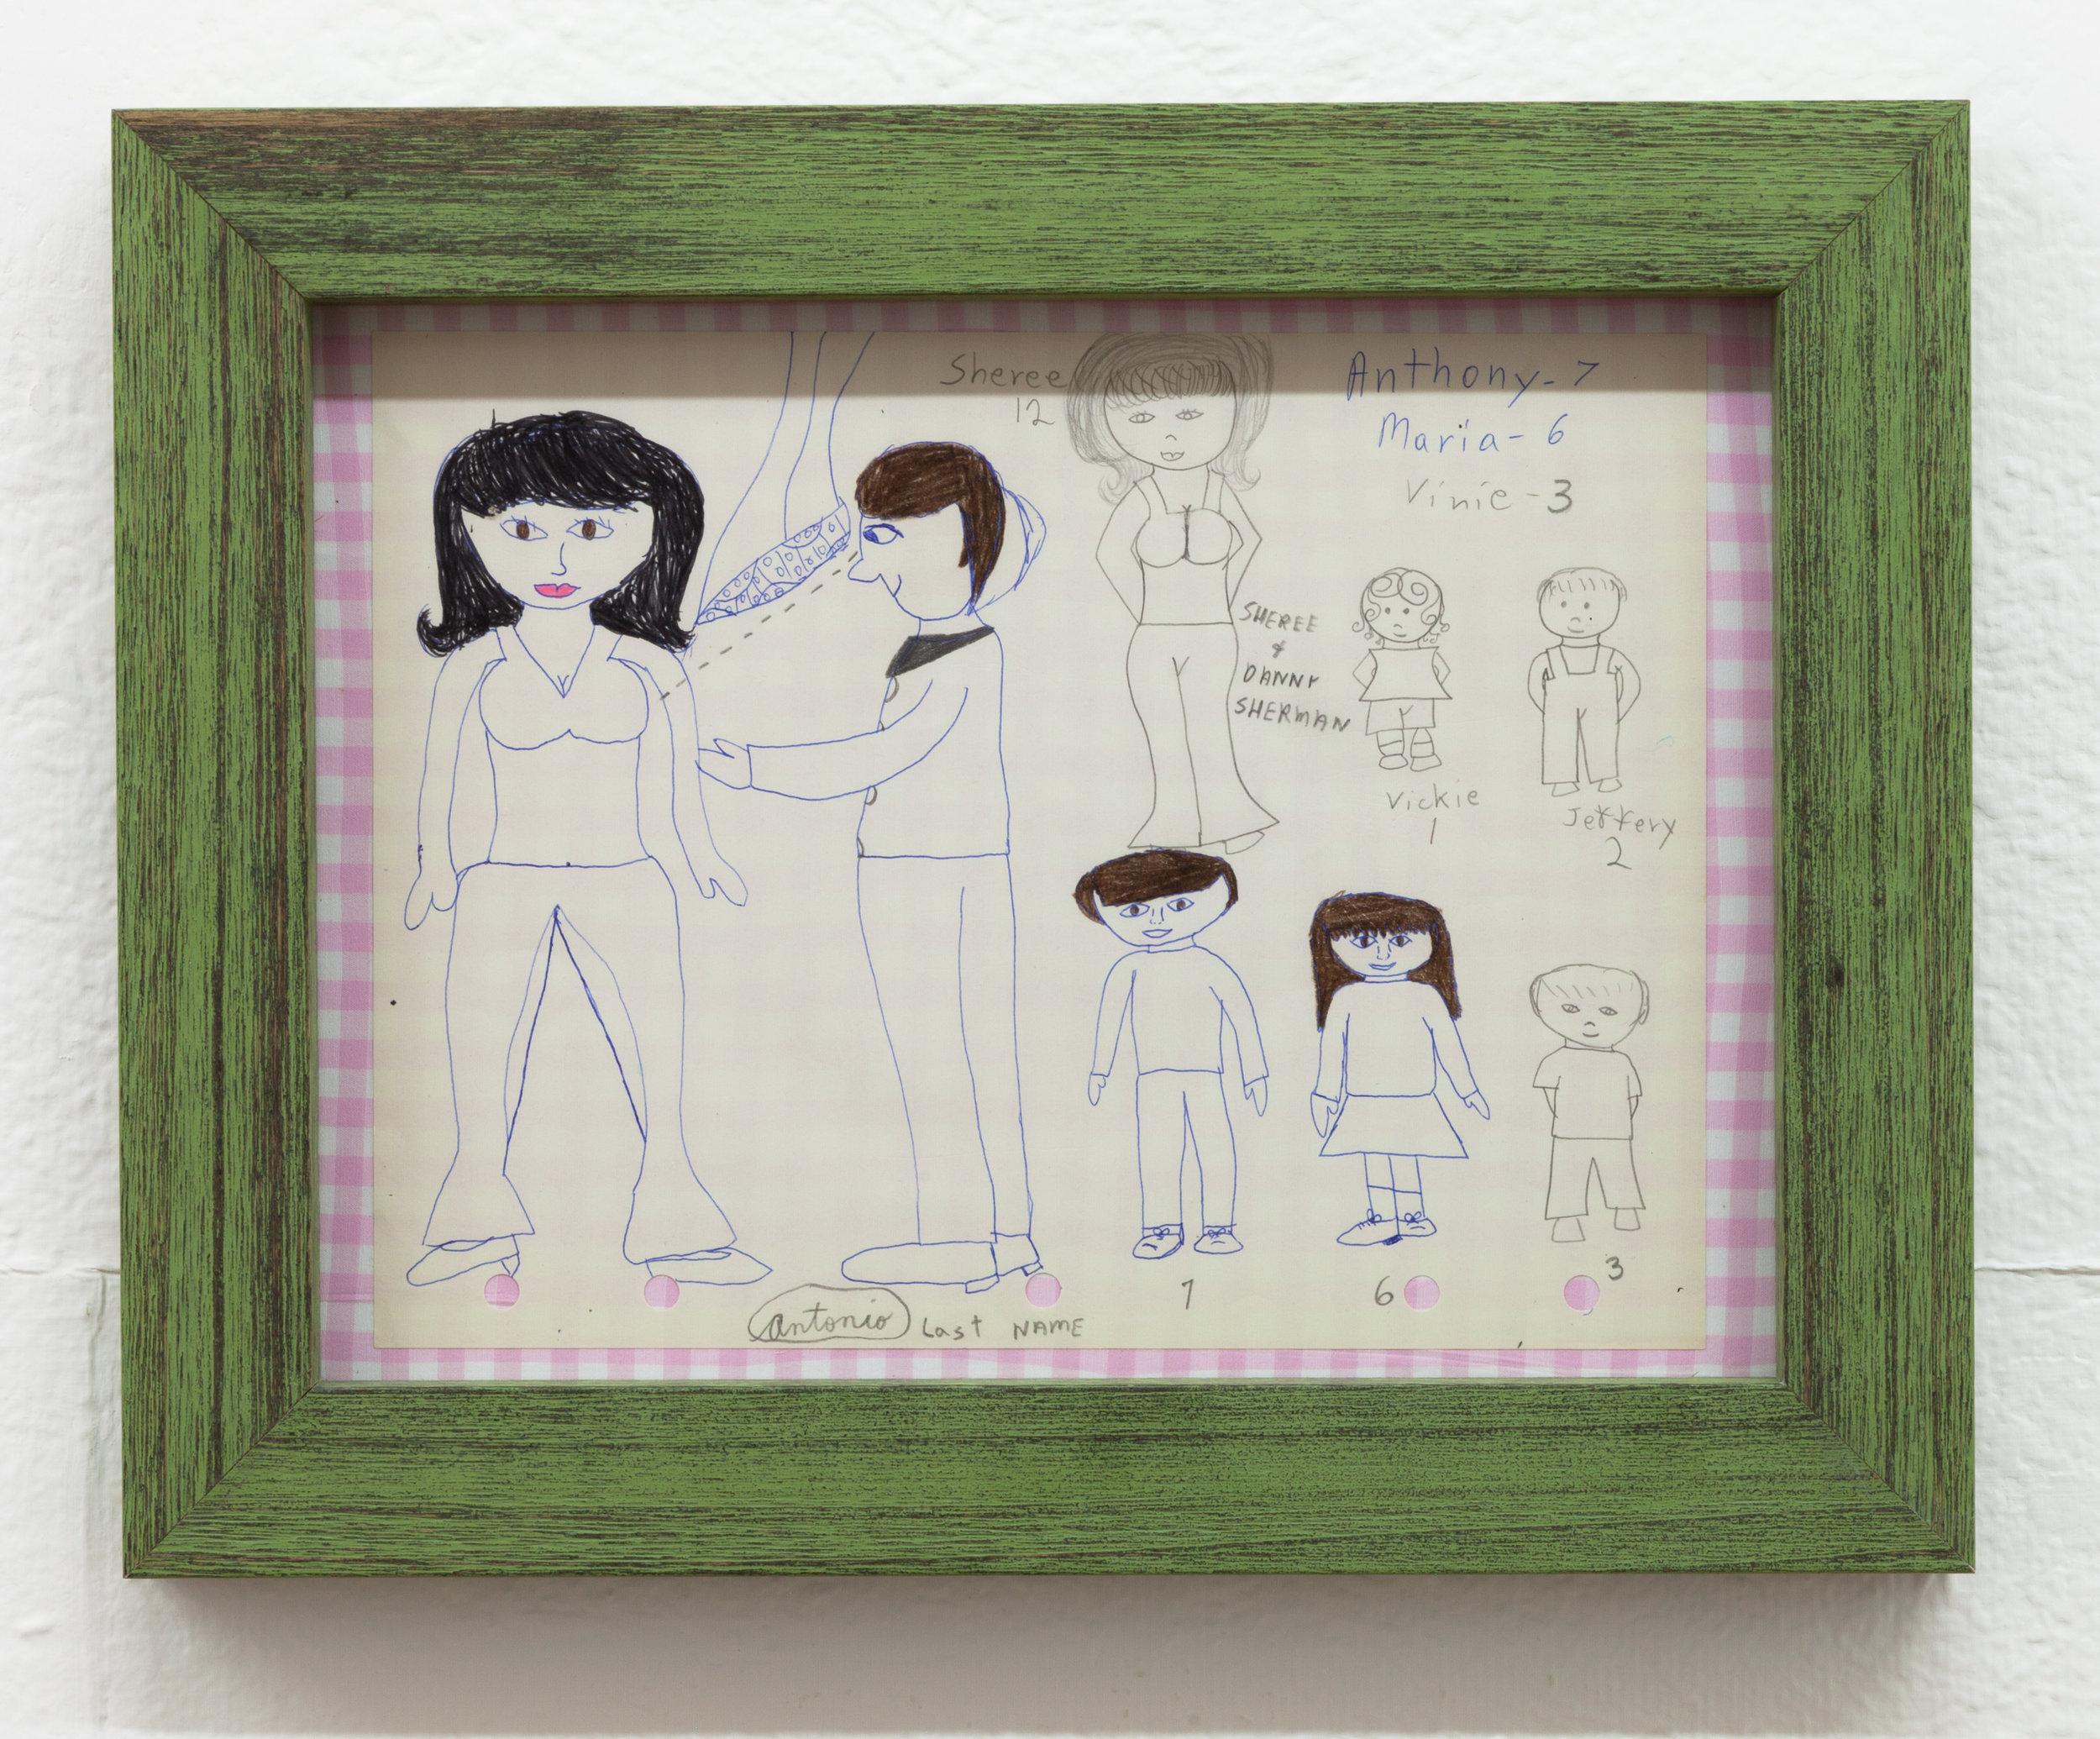 Aunt Nancy, Antonio, Circa 1963-1968 Pen and pencil on paper 8 x 10.5 inches + frame